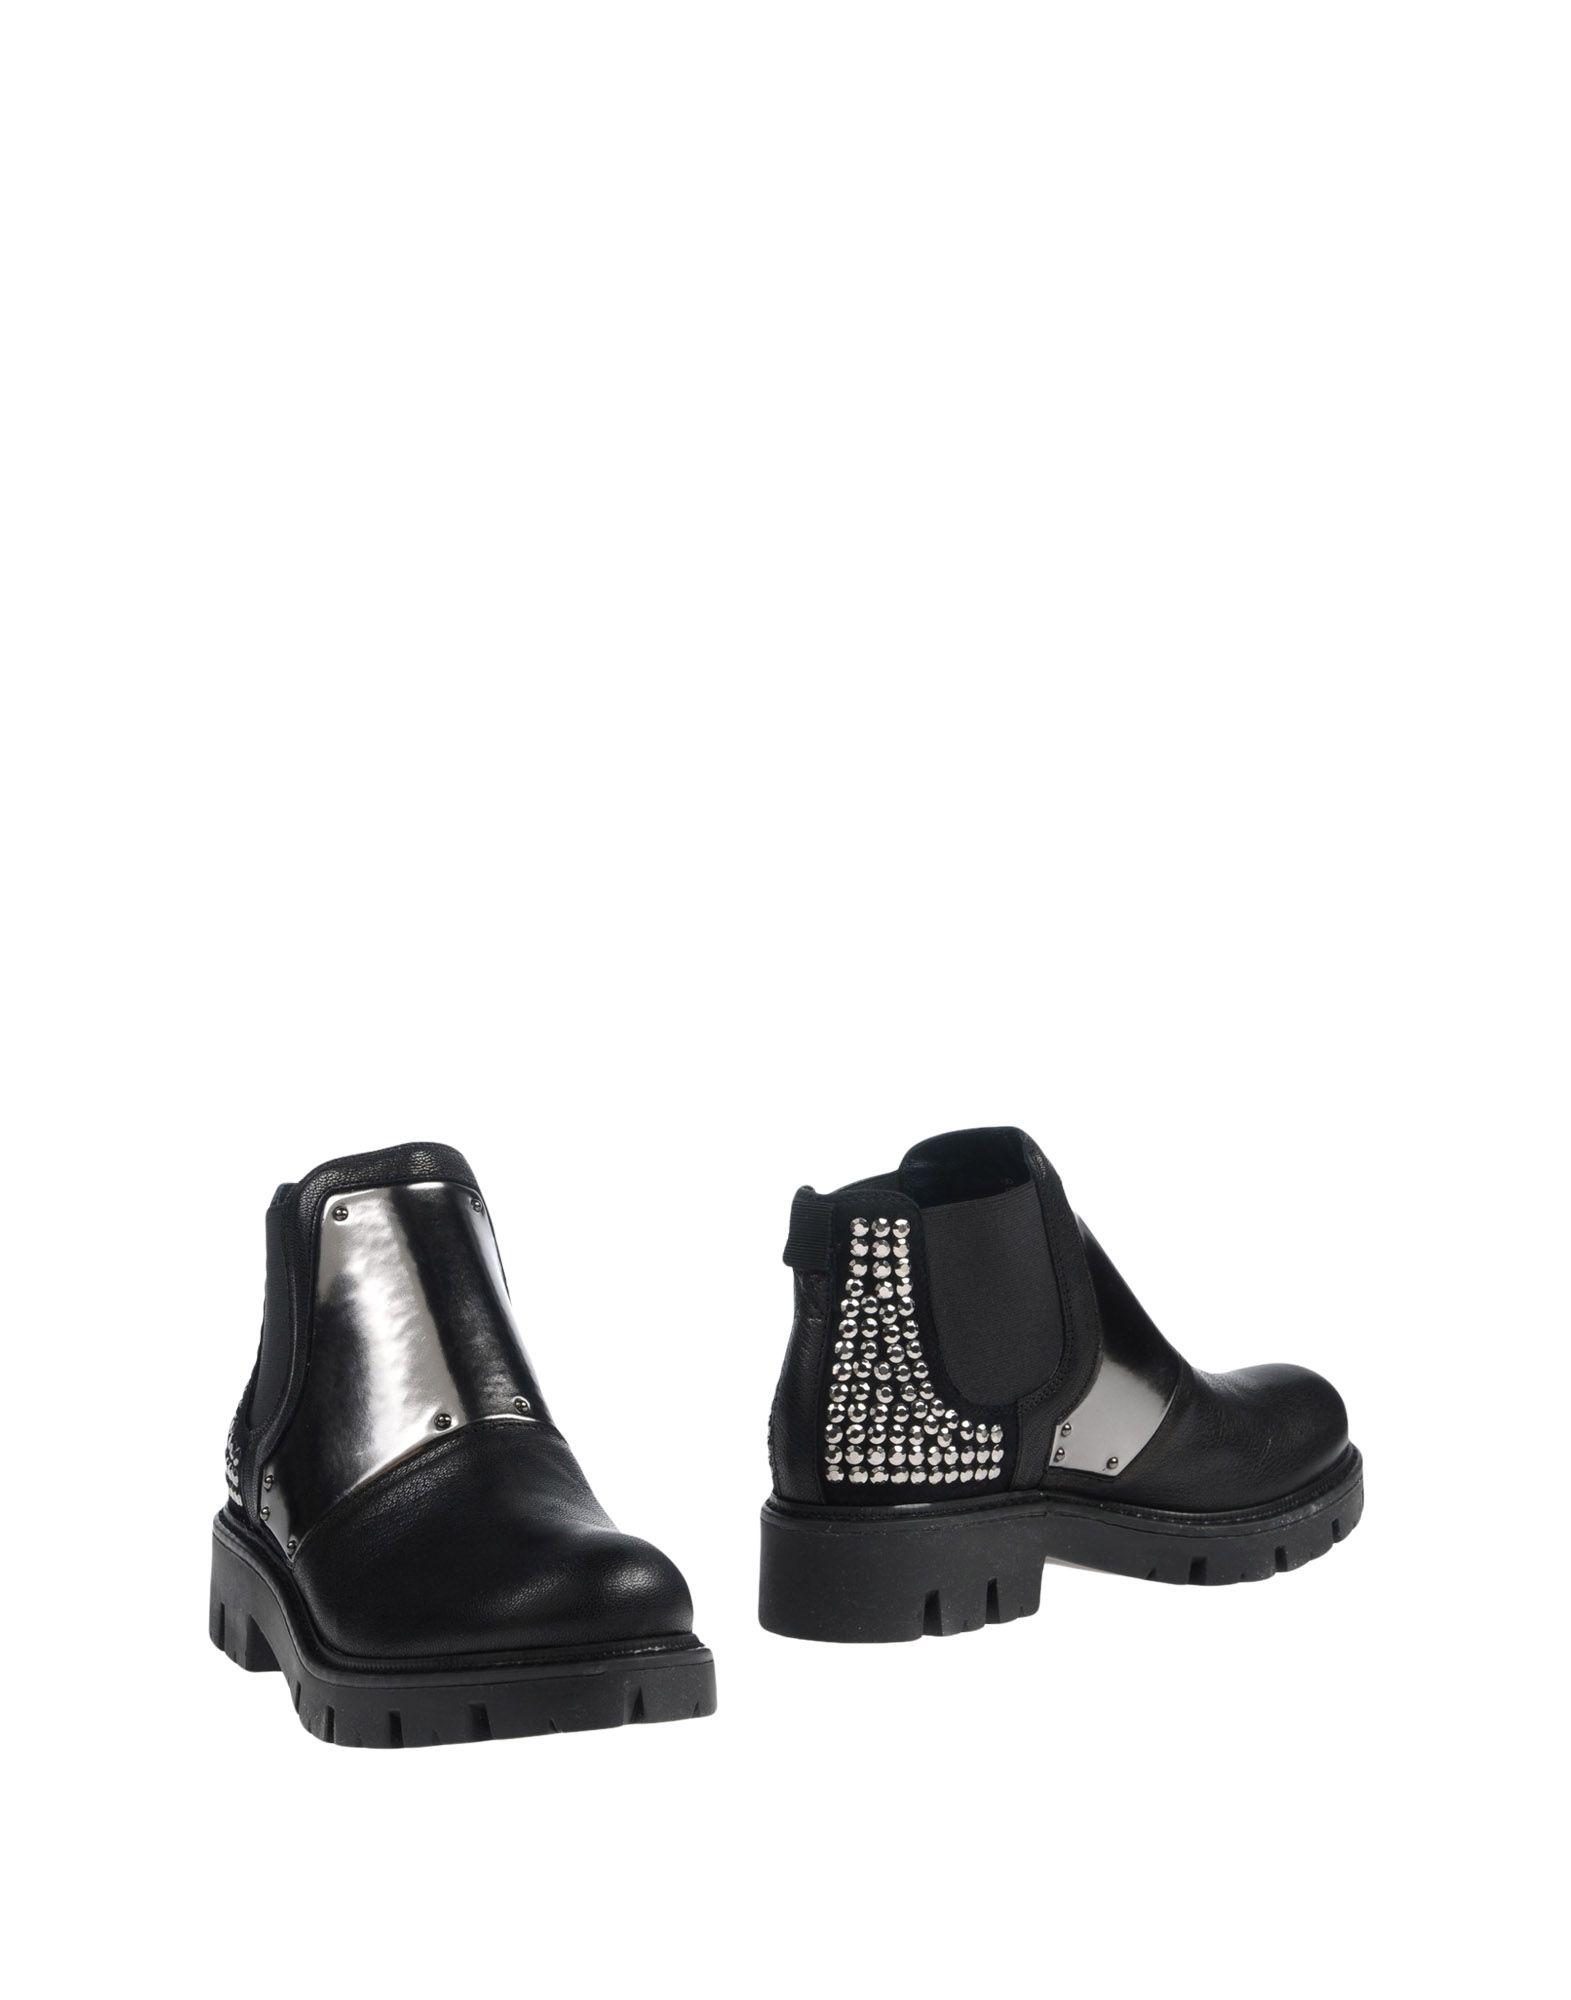 BALDAN Полусапоги и высокие ботинки magazzini del sale полусапоги и высокие ботинки